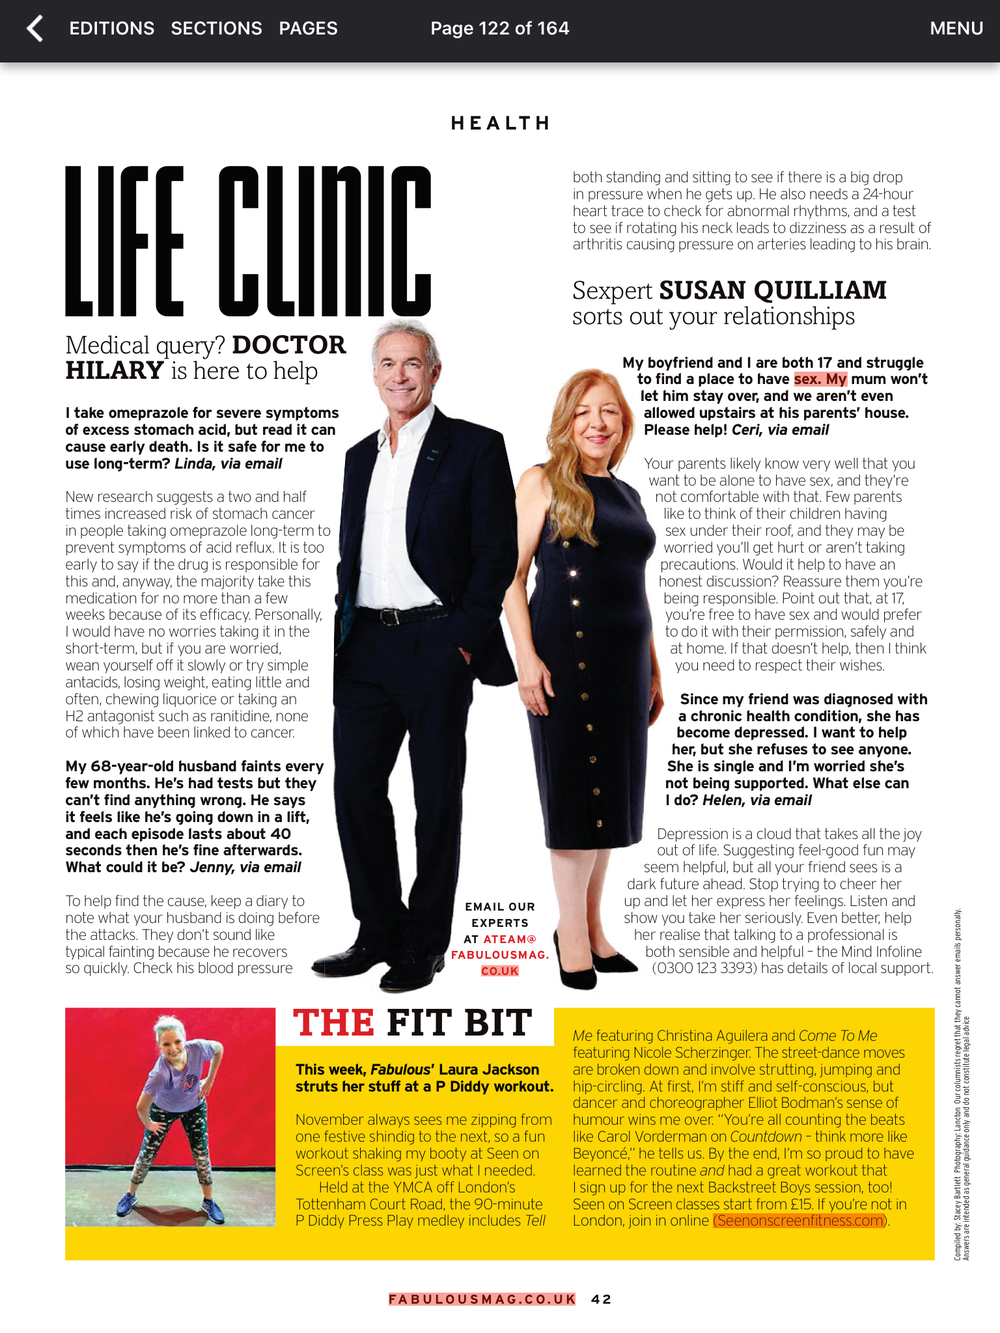 Fabulous Magazine 12th November 2017 Coverage 1.PNG